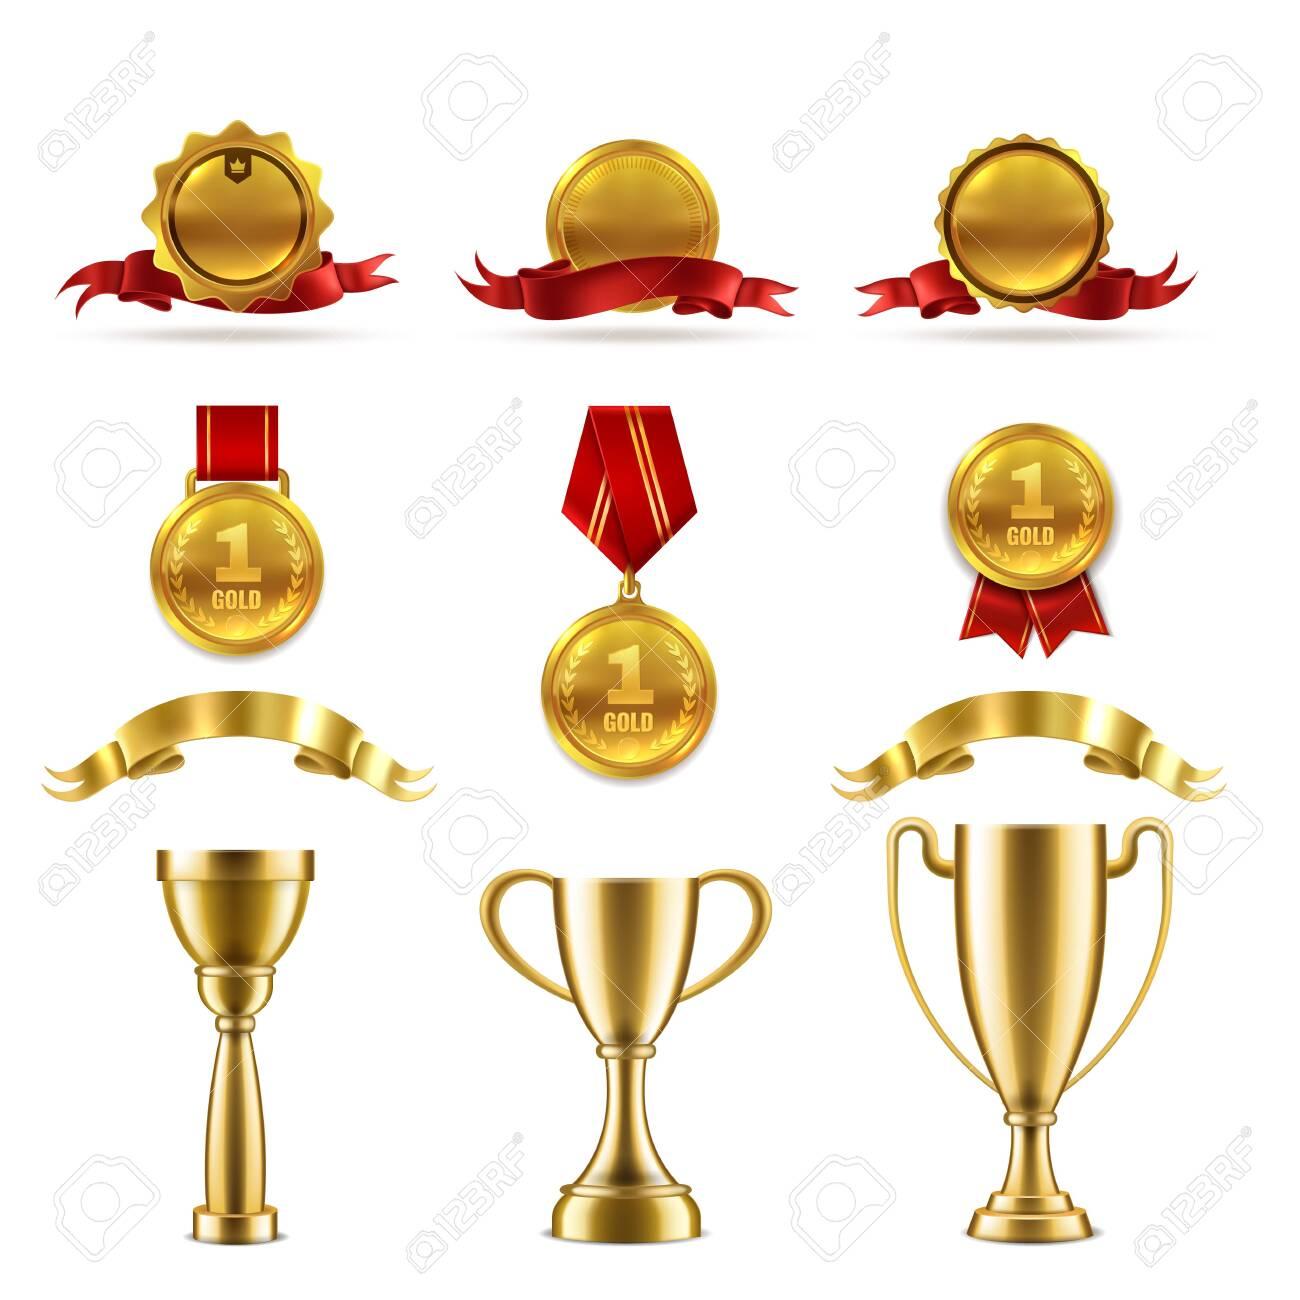 Sport or game trophy set. Gold reward badges and award cups for achievement of best success winner vector rating number medal image - 135593924